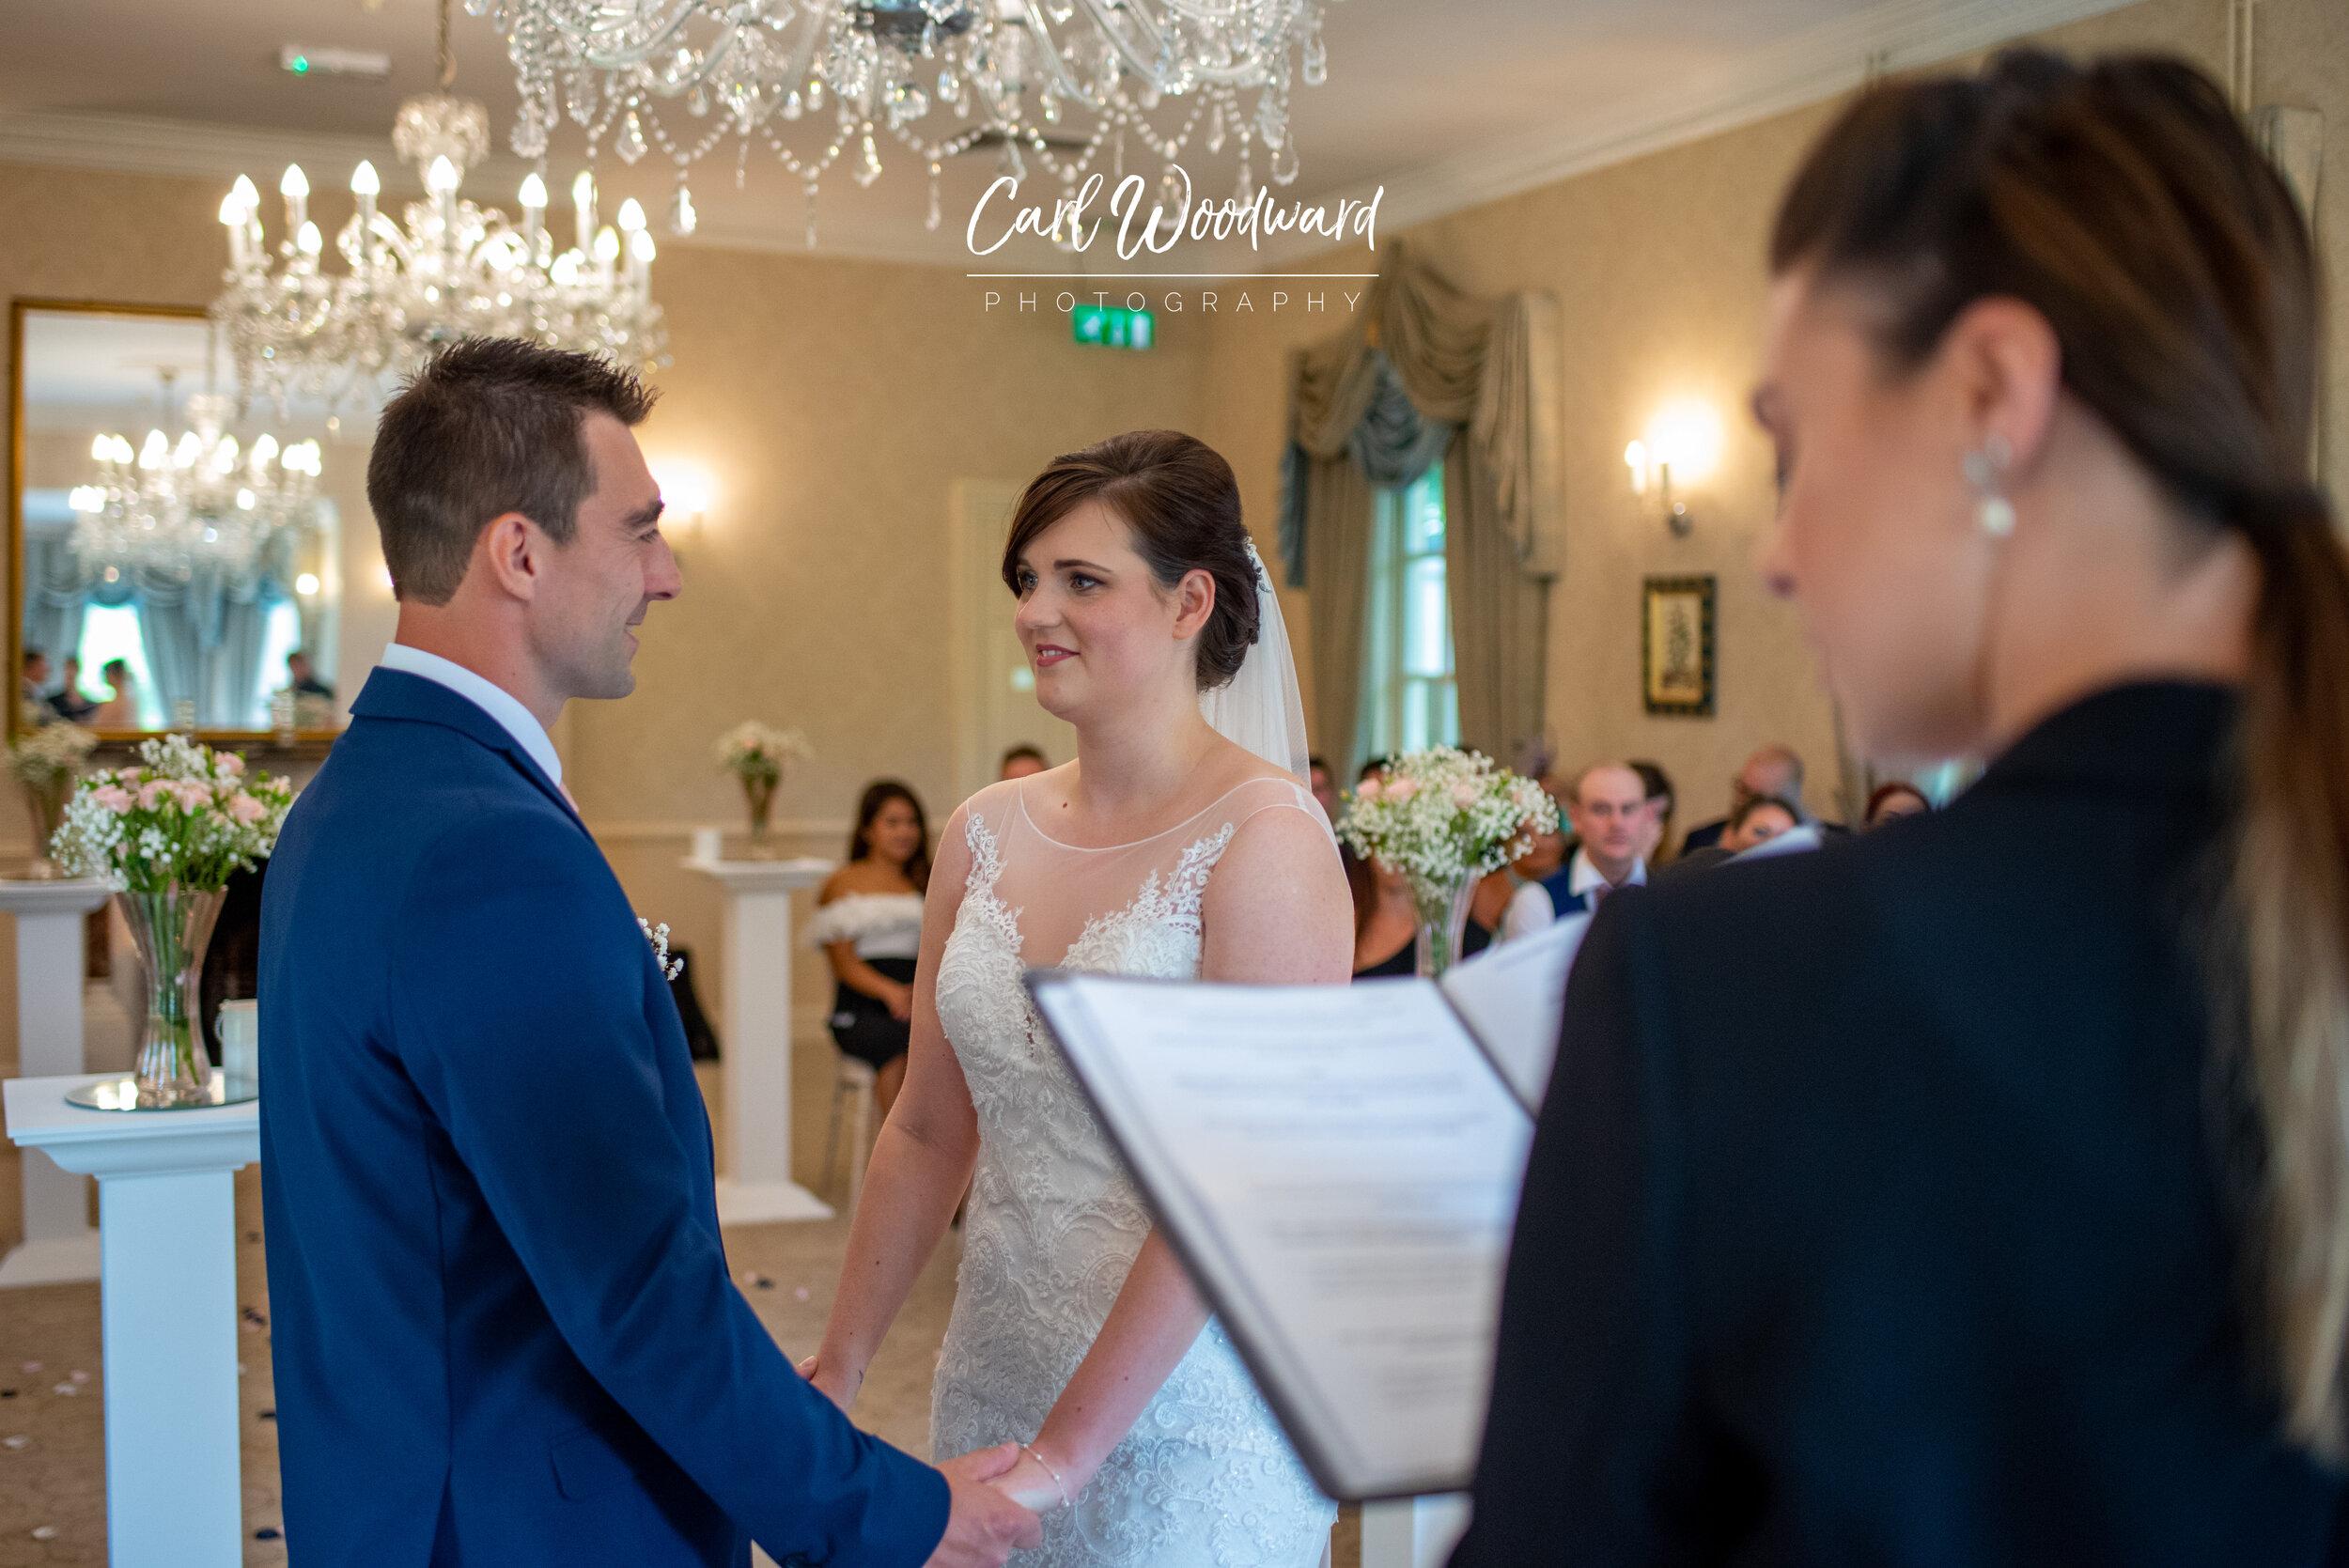 009-De-Courcesys-Manor-Weddings-Cardiff-Wedding-Photographer.jpg